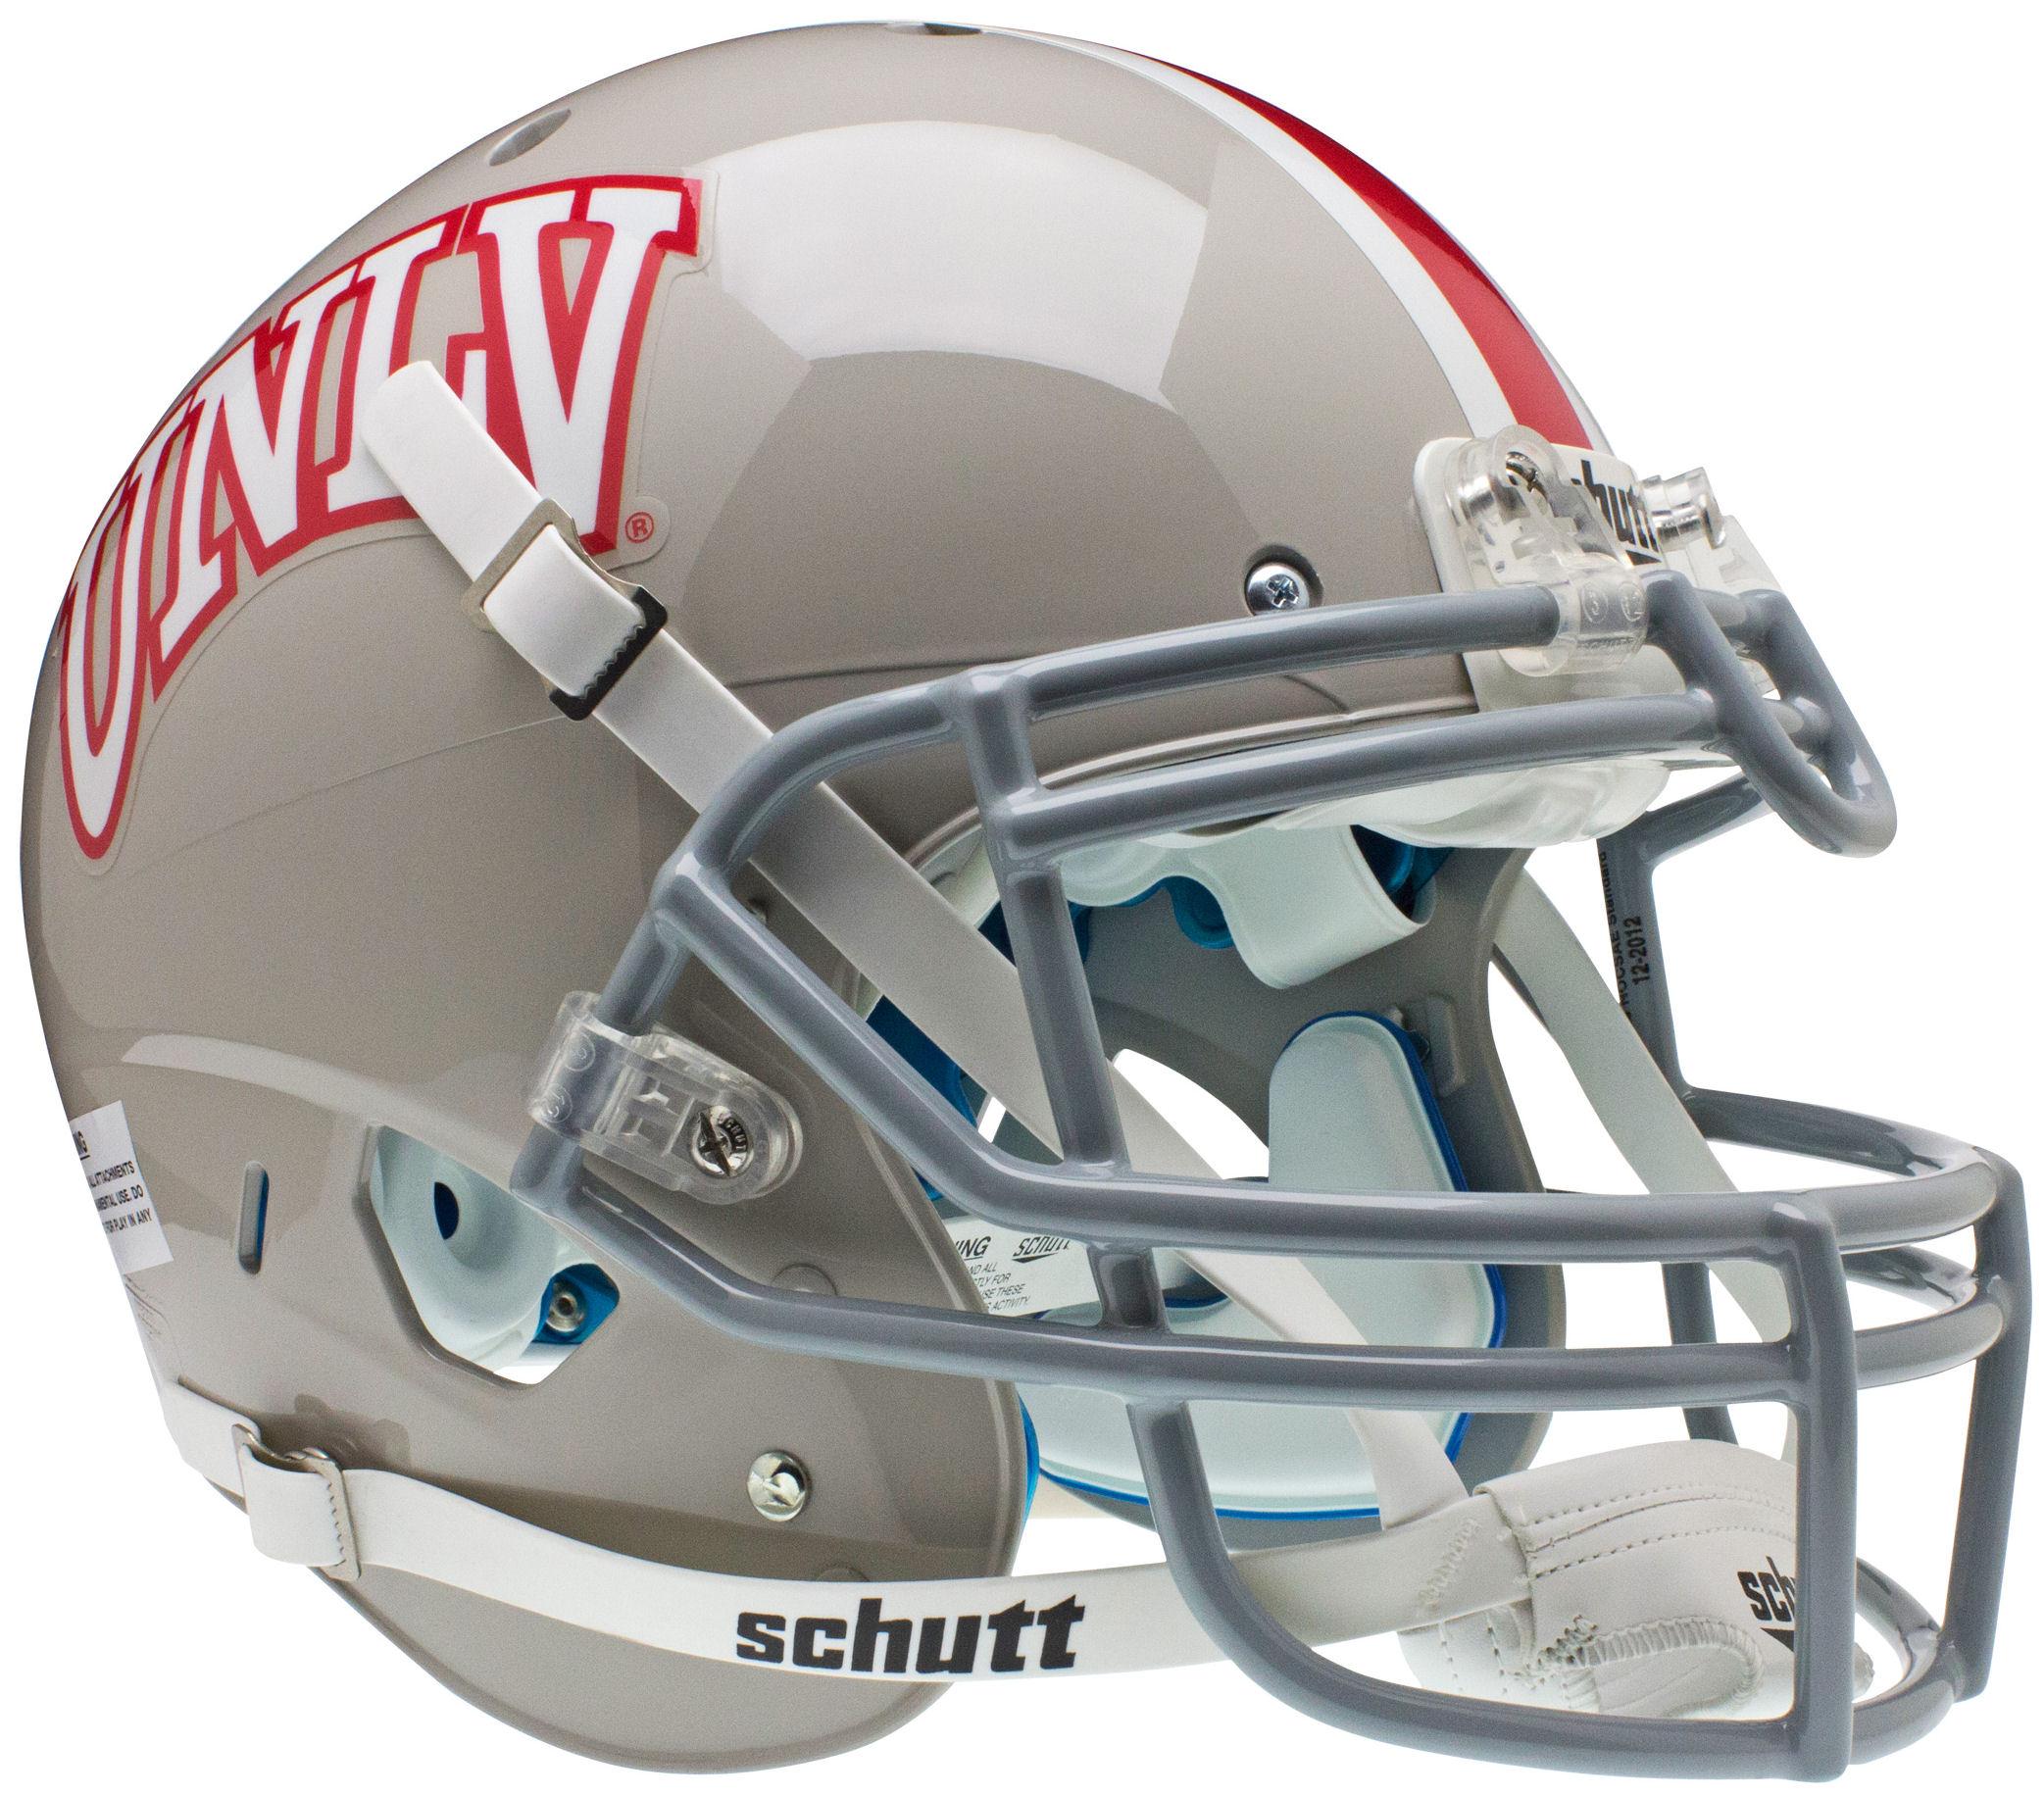 UNLV Runnin Rebels Authentic College XP Football Helmet Schutt